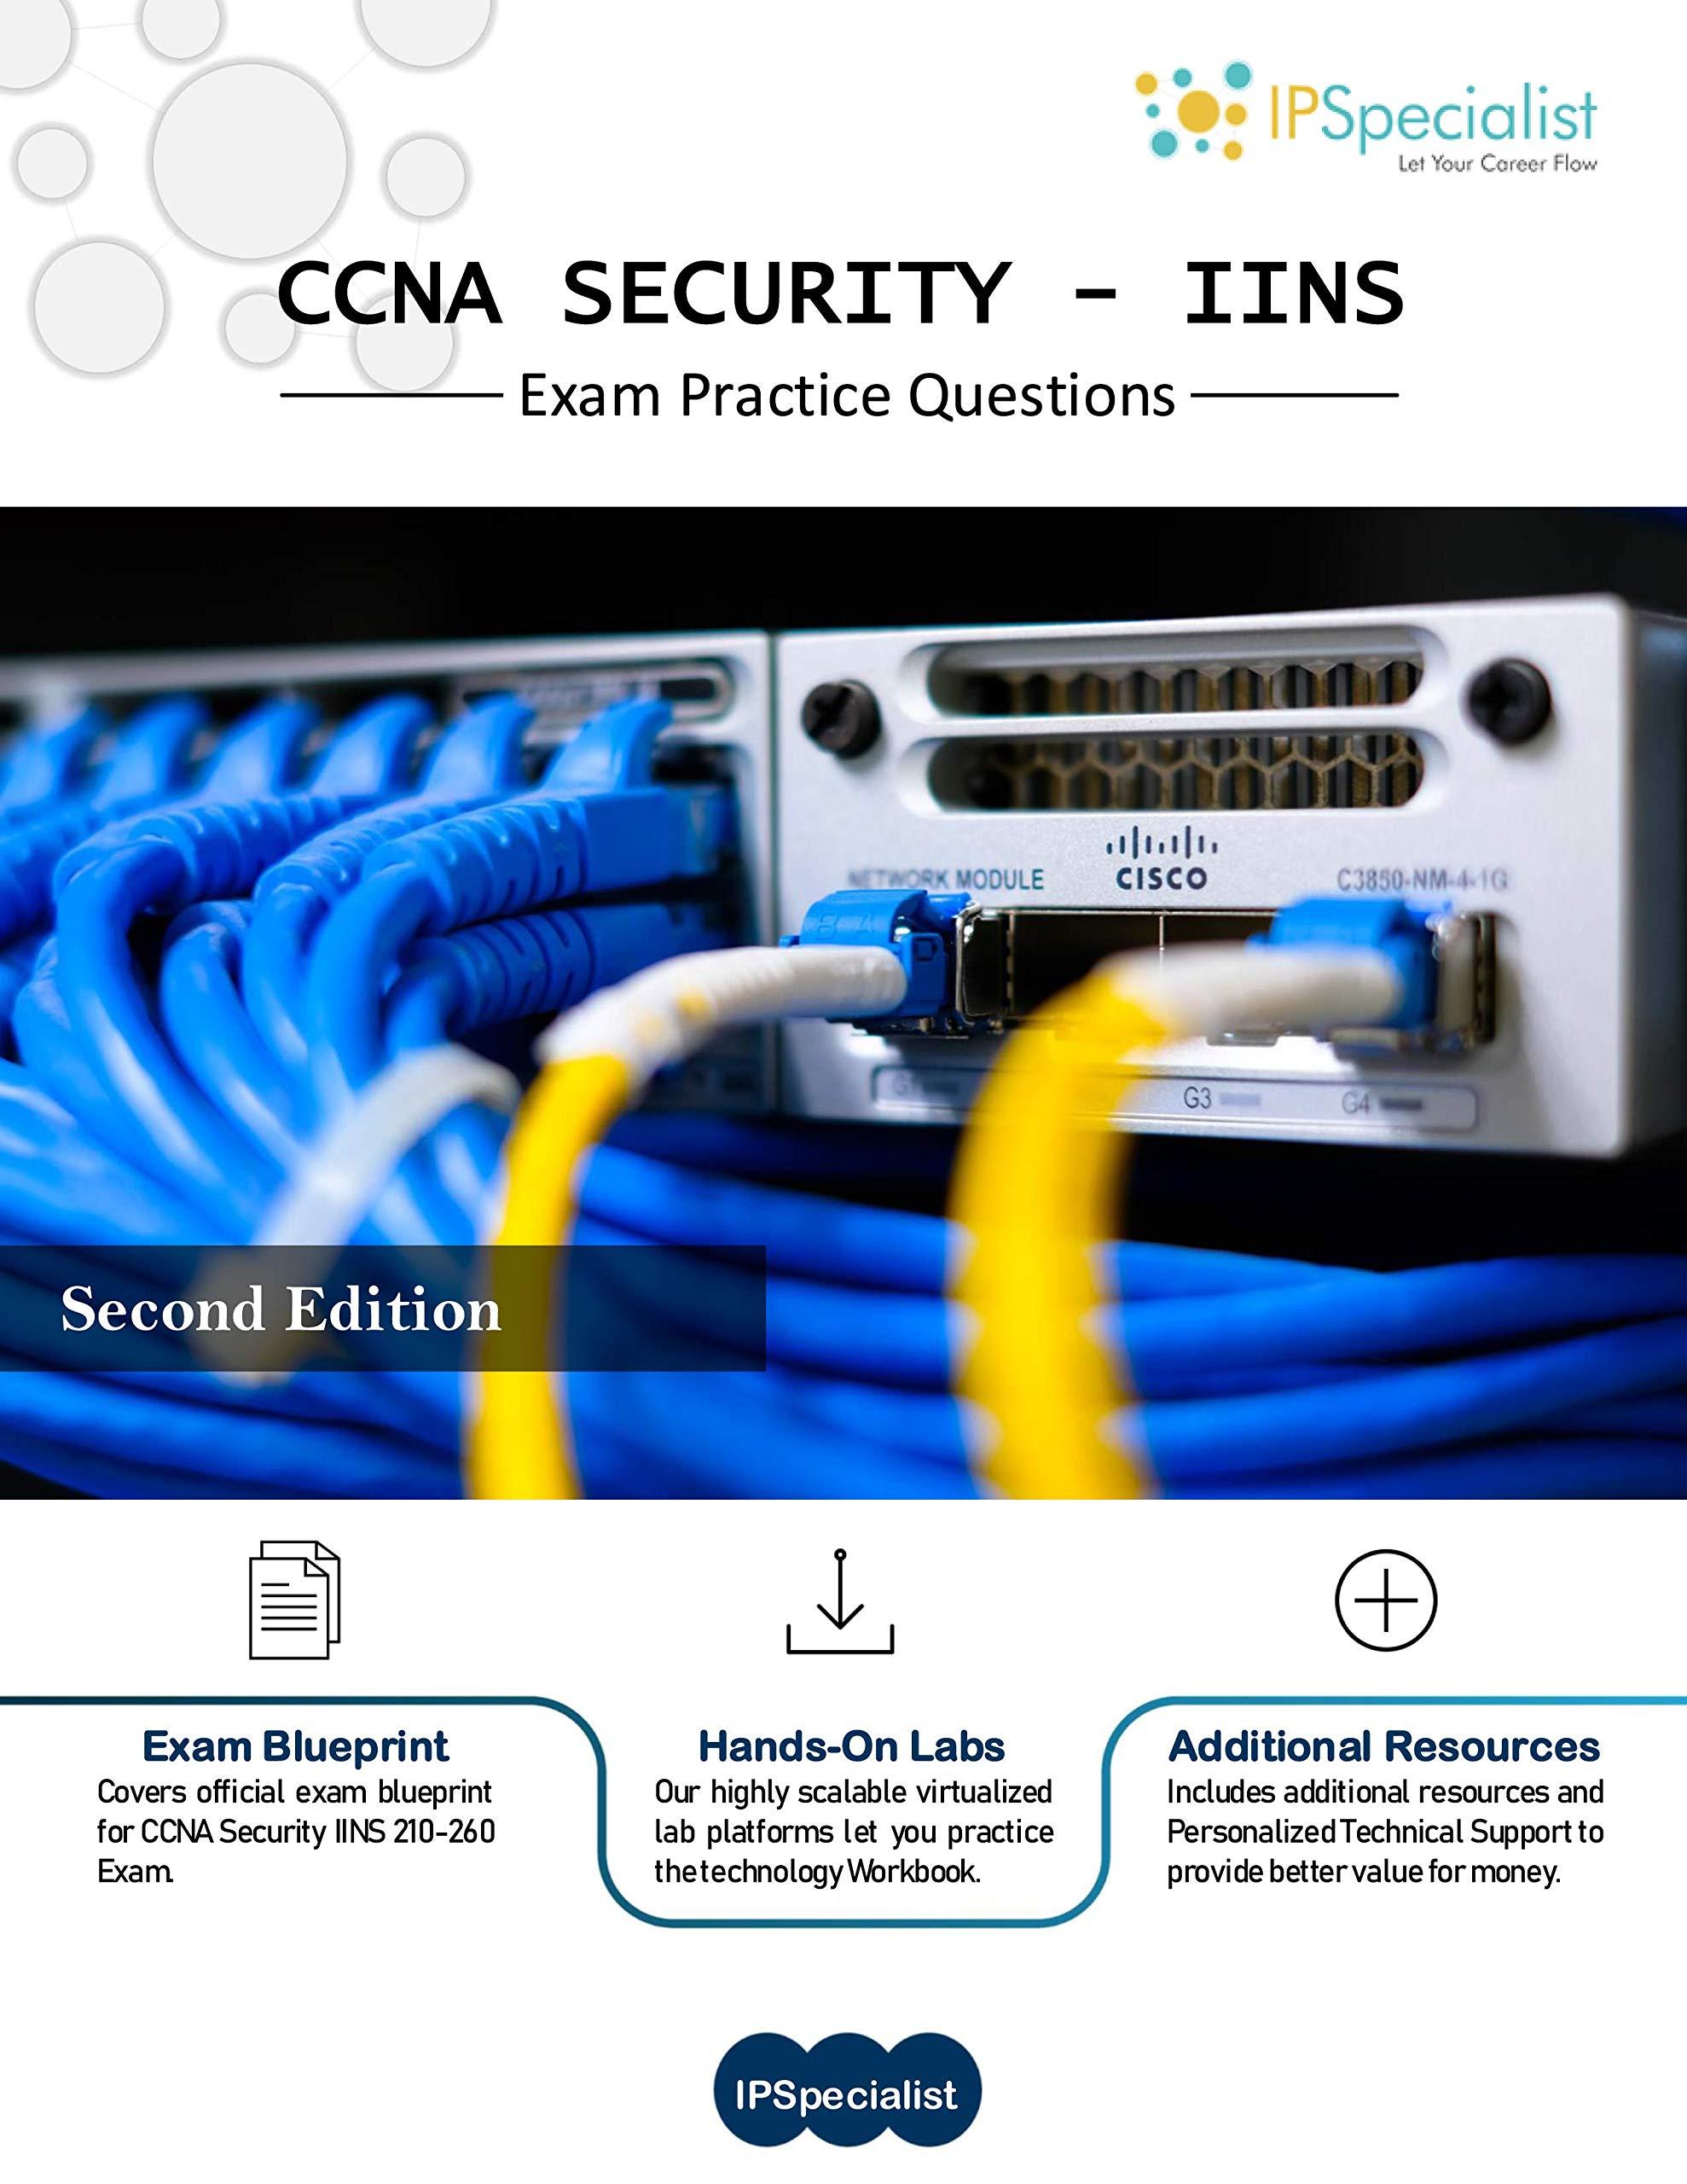 CCNA Security (IINS 210-260) Exam Practice Questions: 350+ Exam Questions